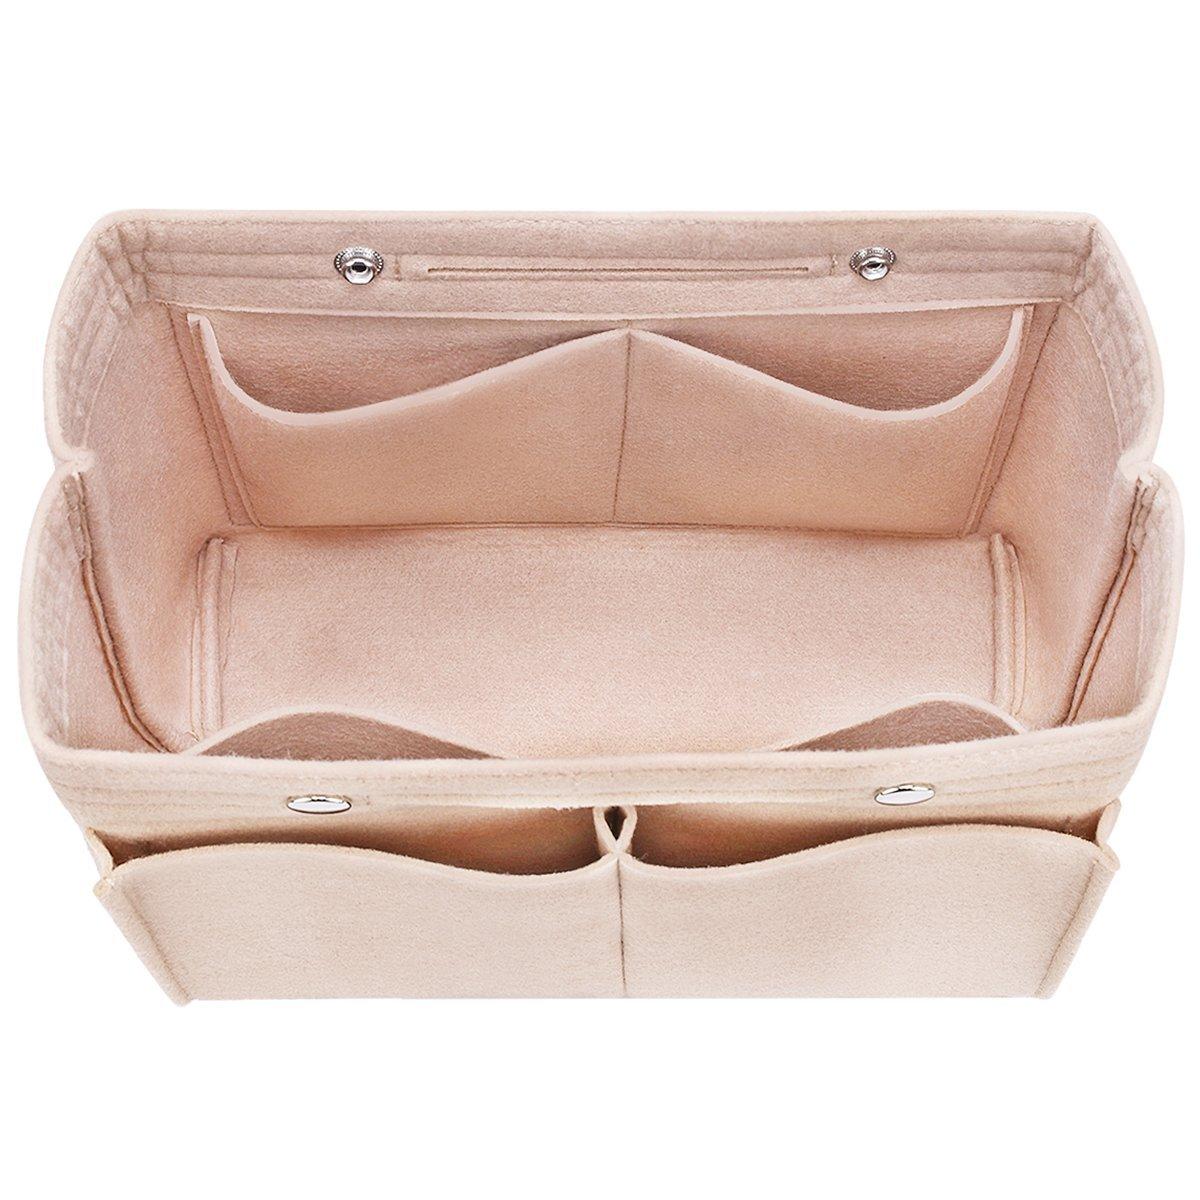 0e831aec071 Top1  Felt Insert Bag Organizer Bag In Bag For Handbag Purse Tote Diaper  Bag